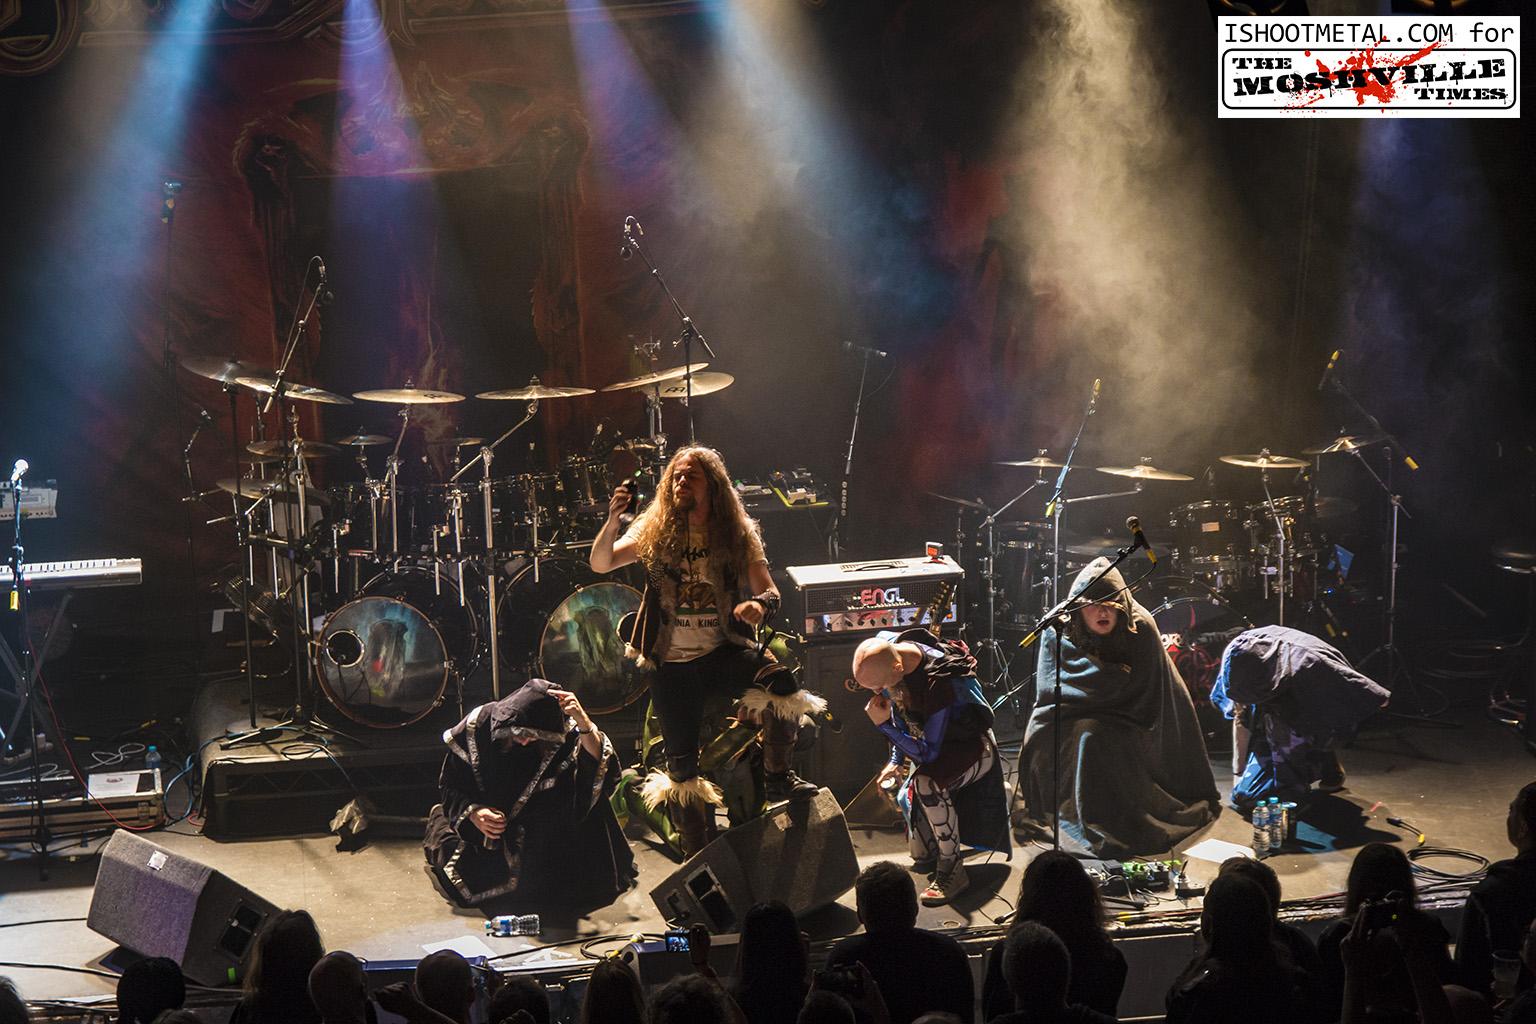 Review: Blind Guardian / Gloryhammer 17/05/2016 -QMU Glasgow